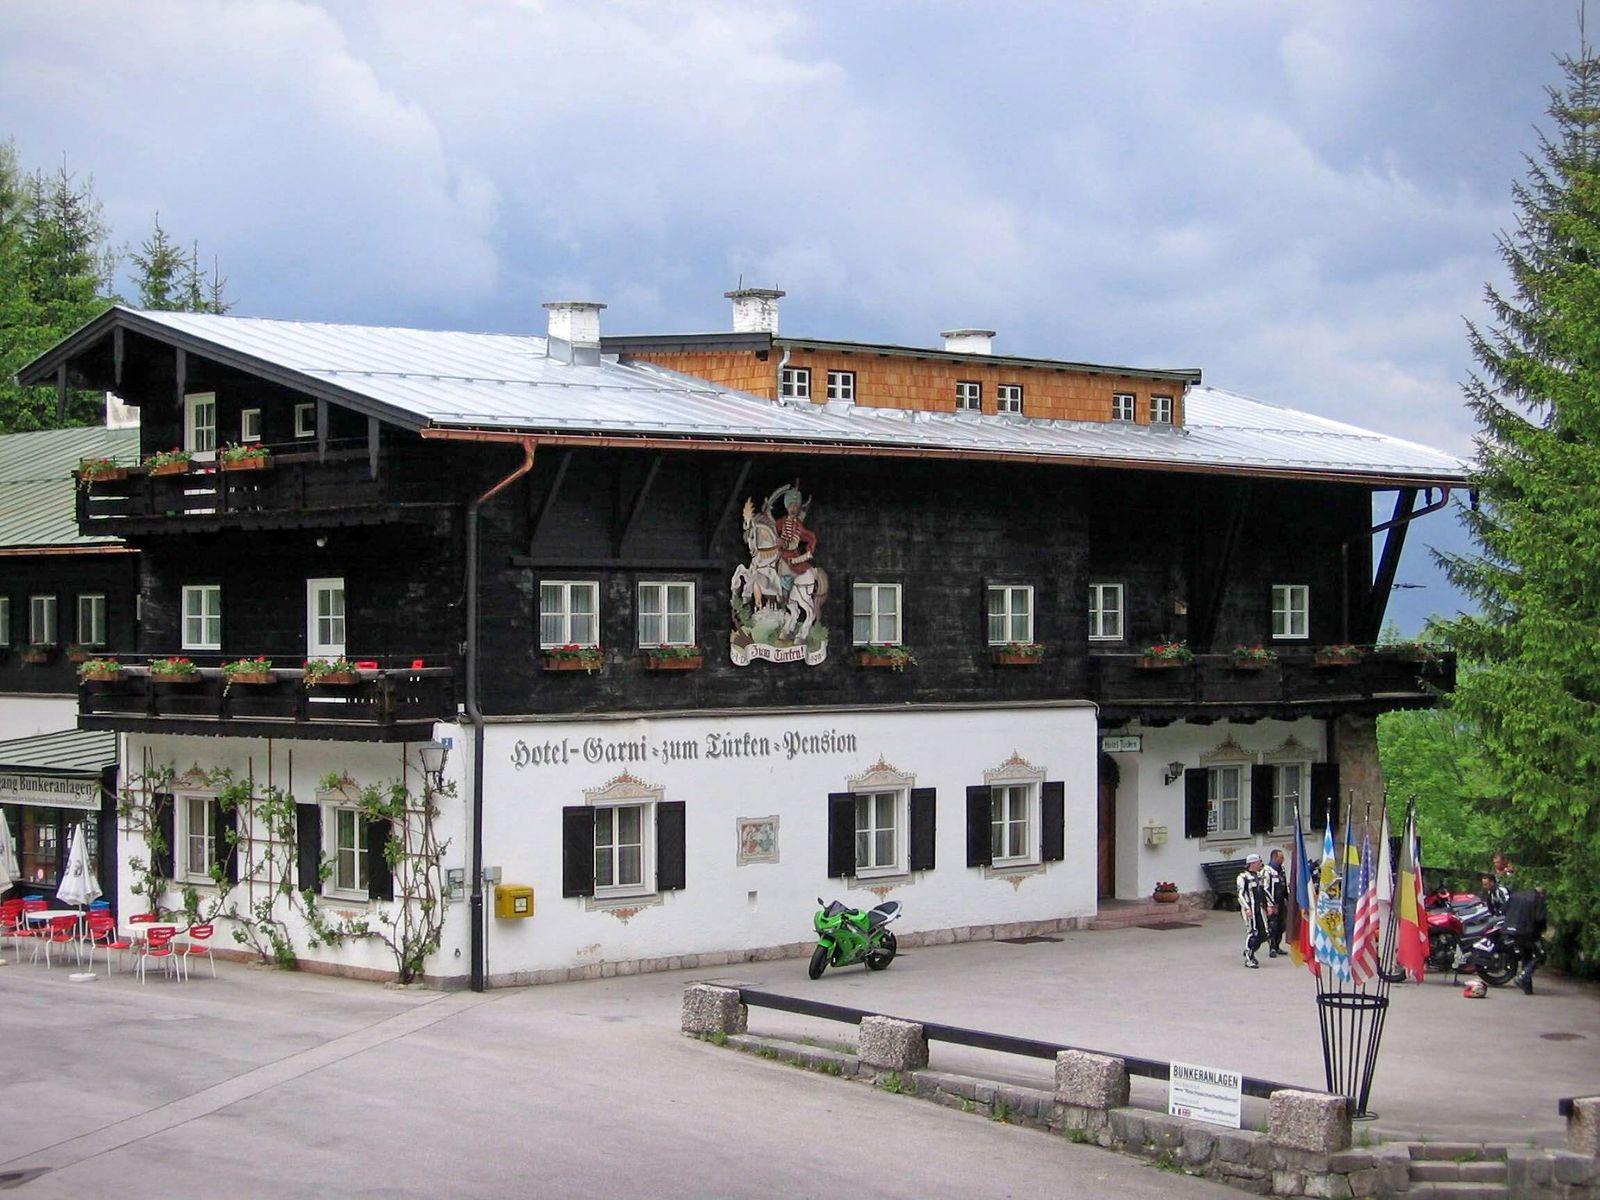 June 6 2006 U S The Hotel zum Tuerken is one of the few Nazi era buildings to survive the 1945